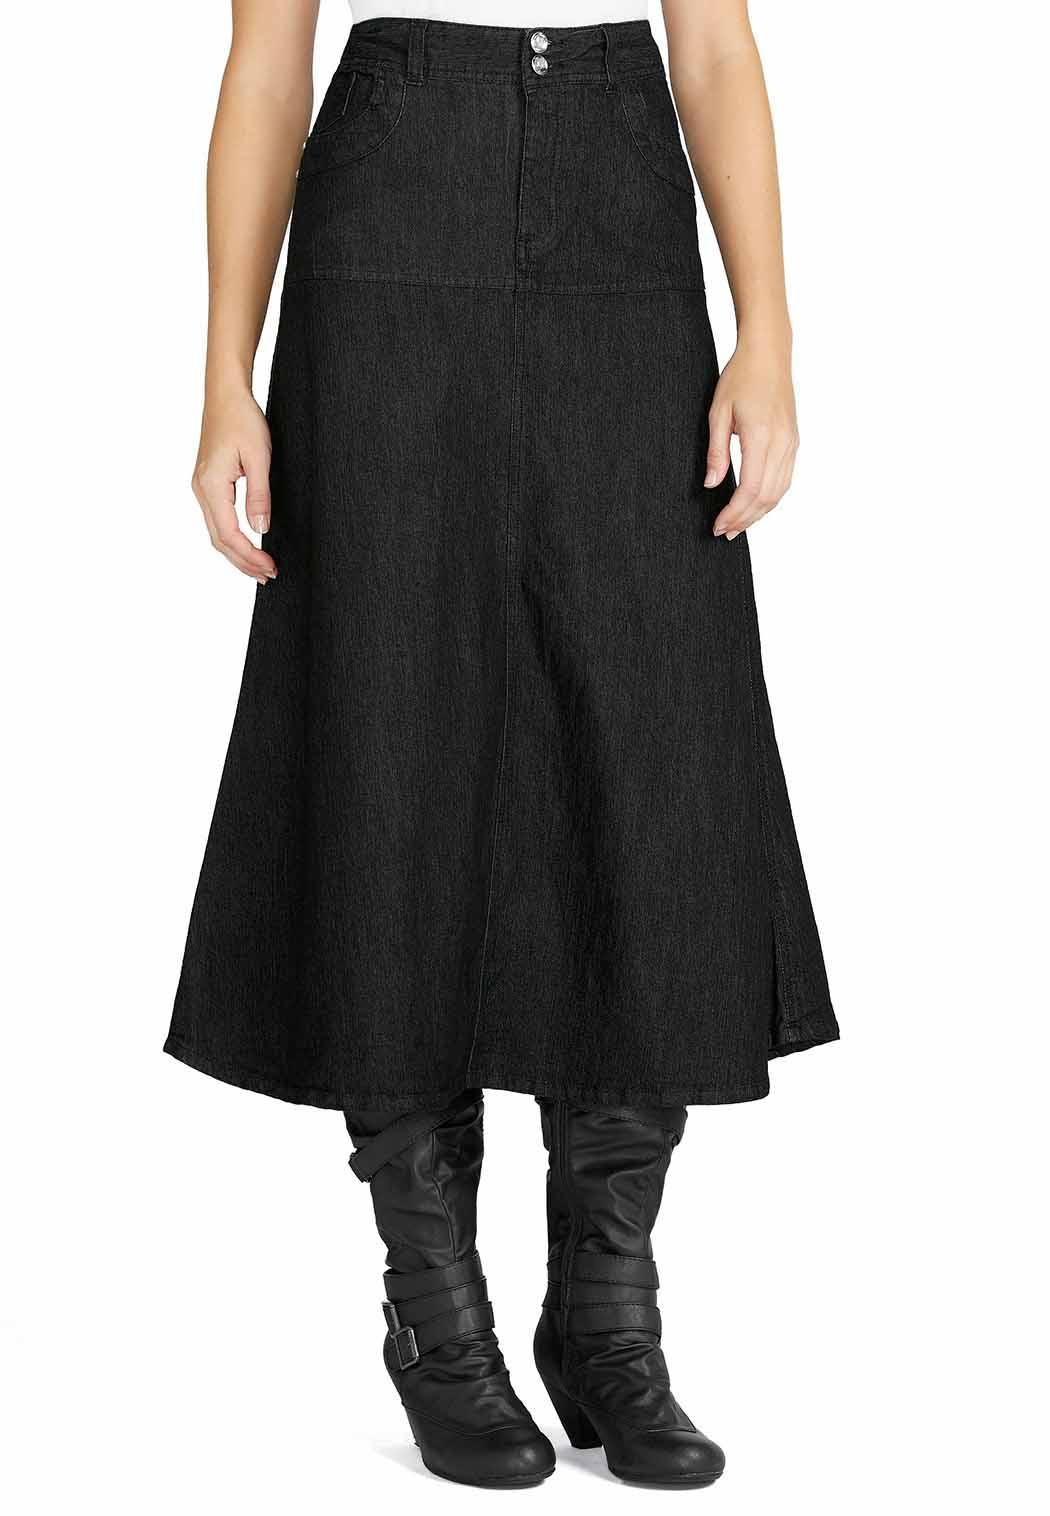 5a74ddbbcb5 Long Flare Dressy Denim Skirt Skirts Cato Fashions